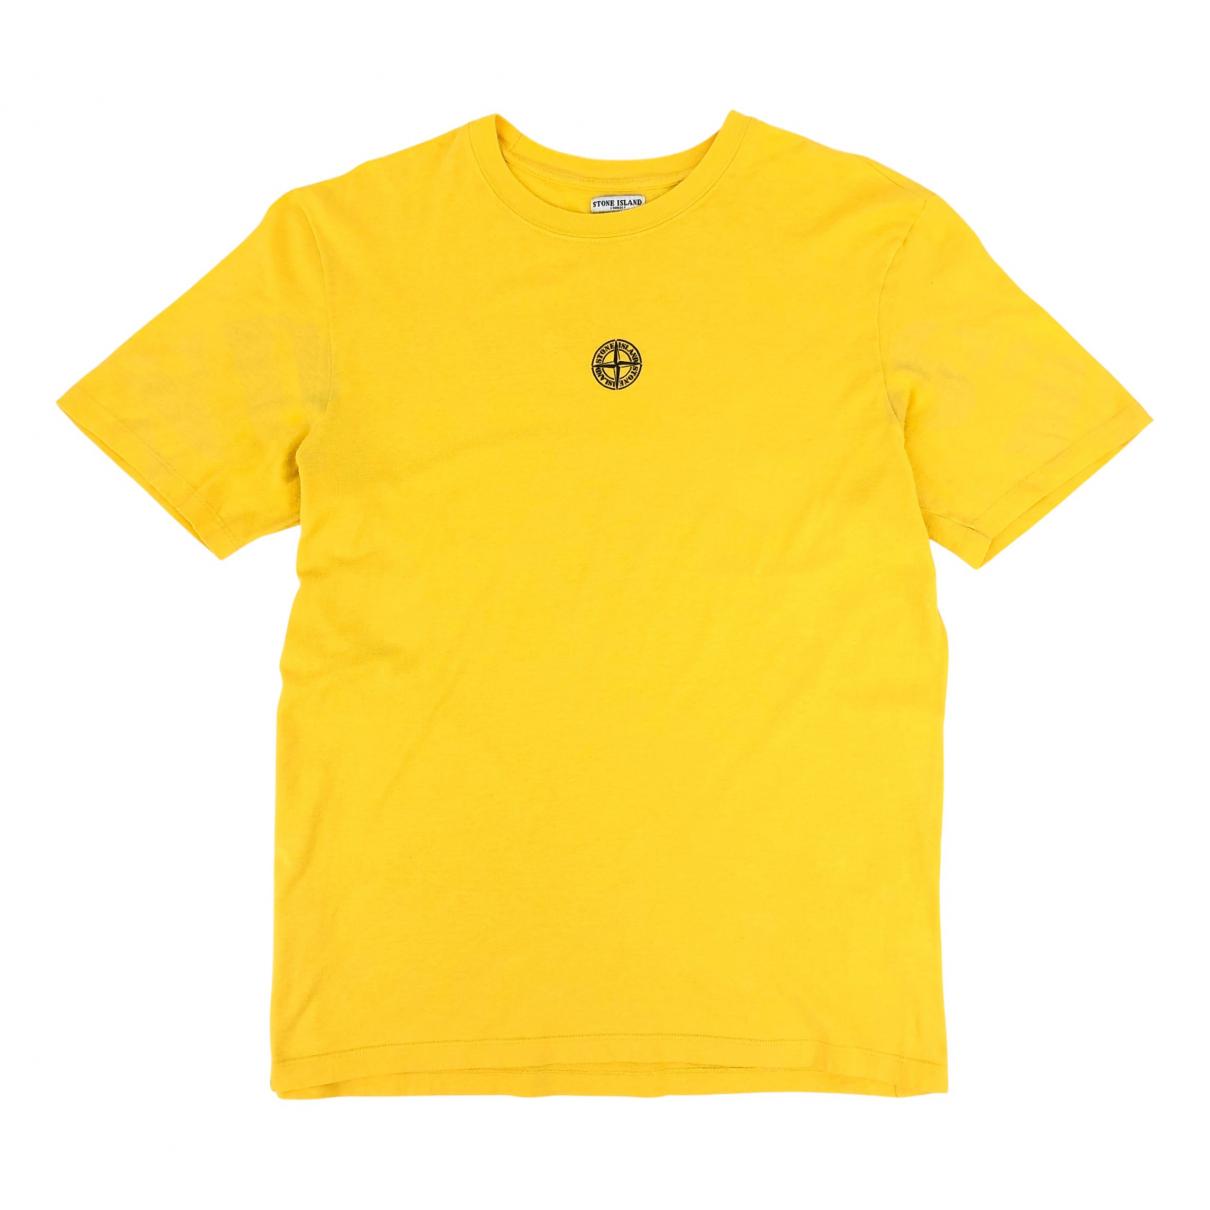 Stone Island - Tee shirts   pour homme en coton - jaune